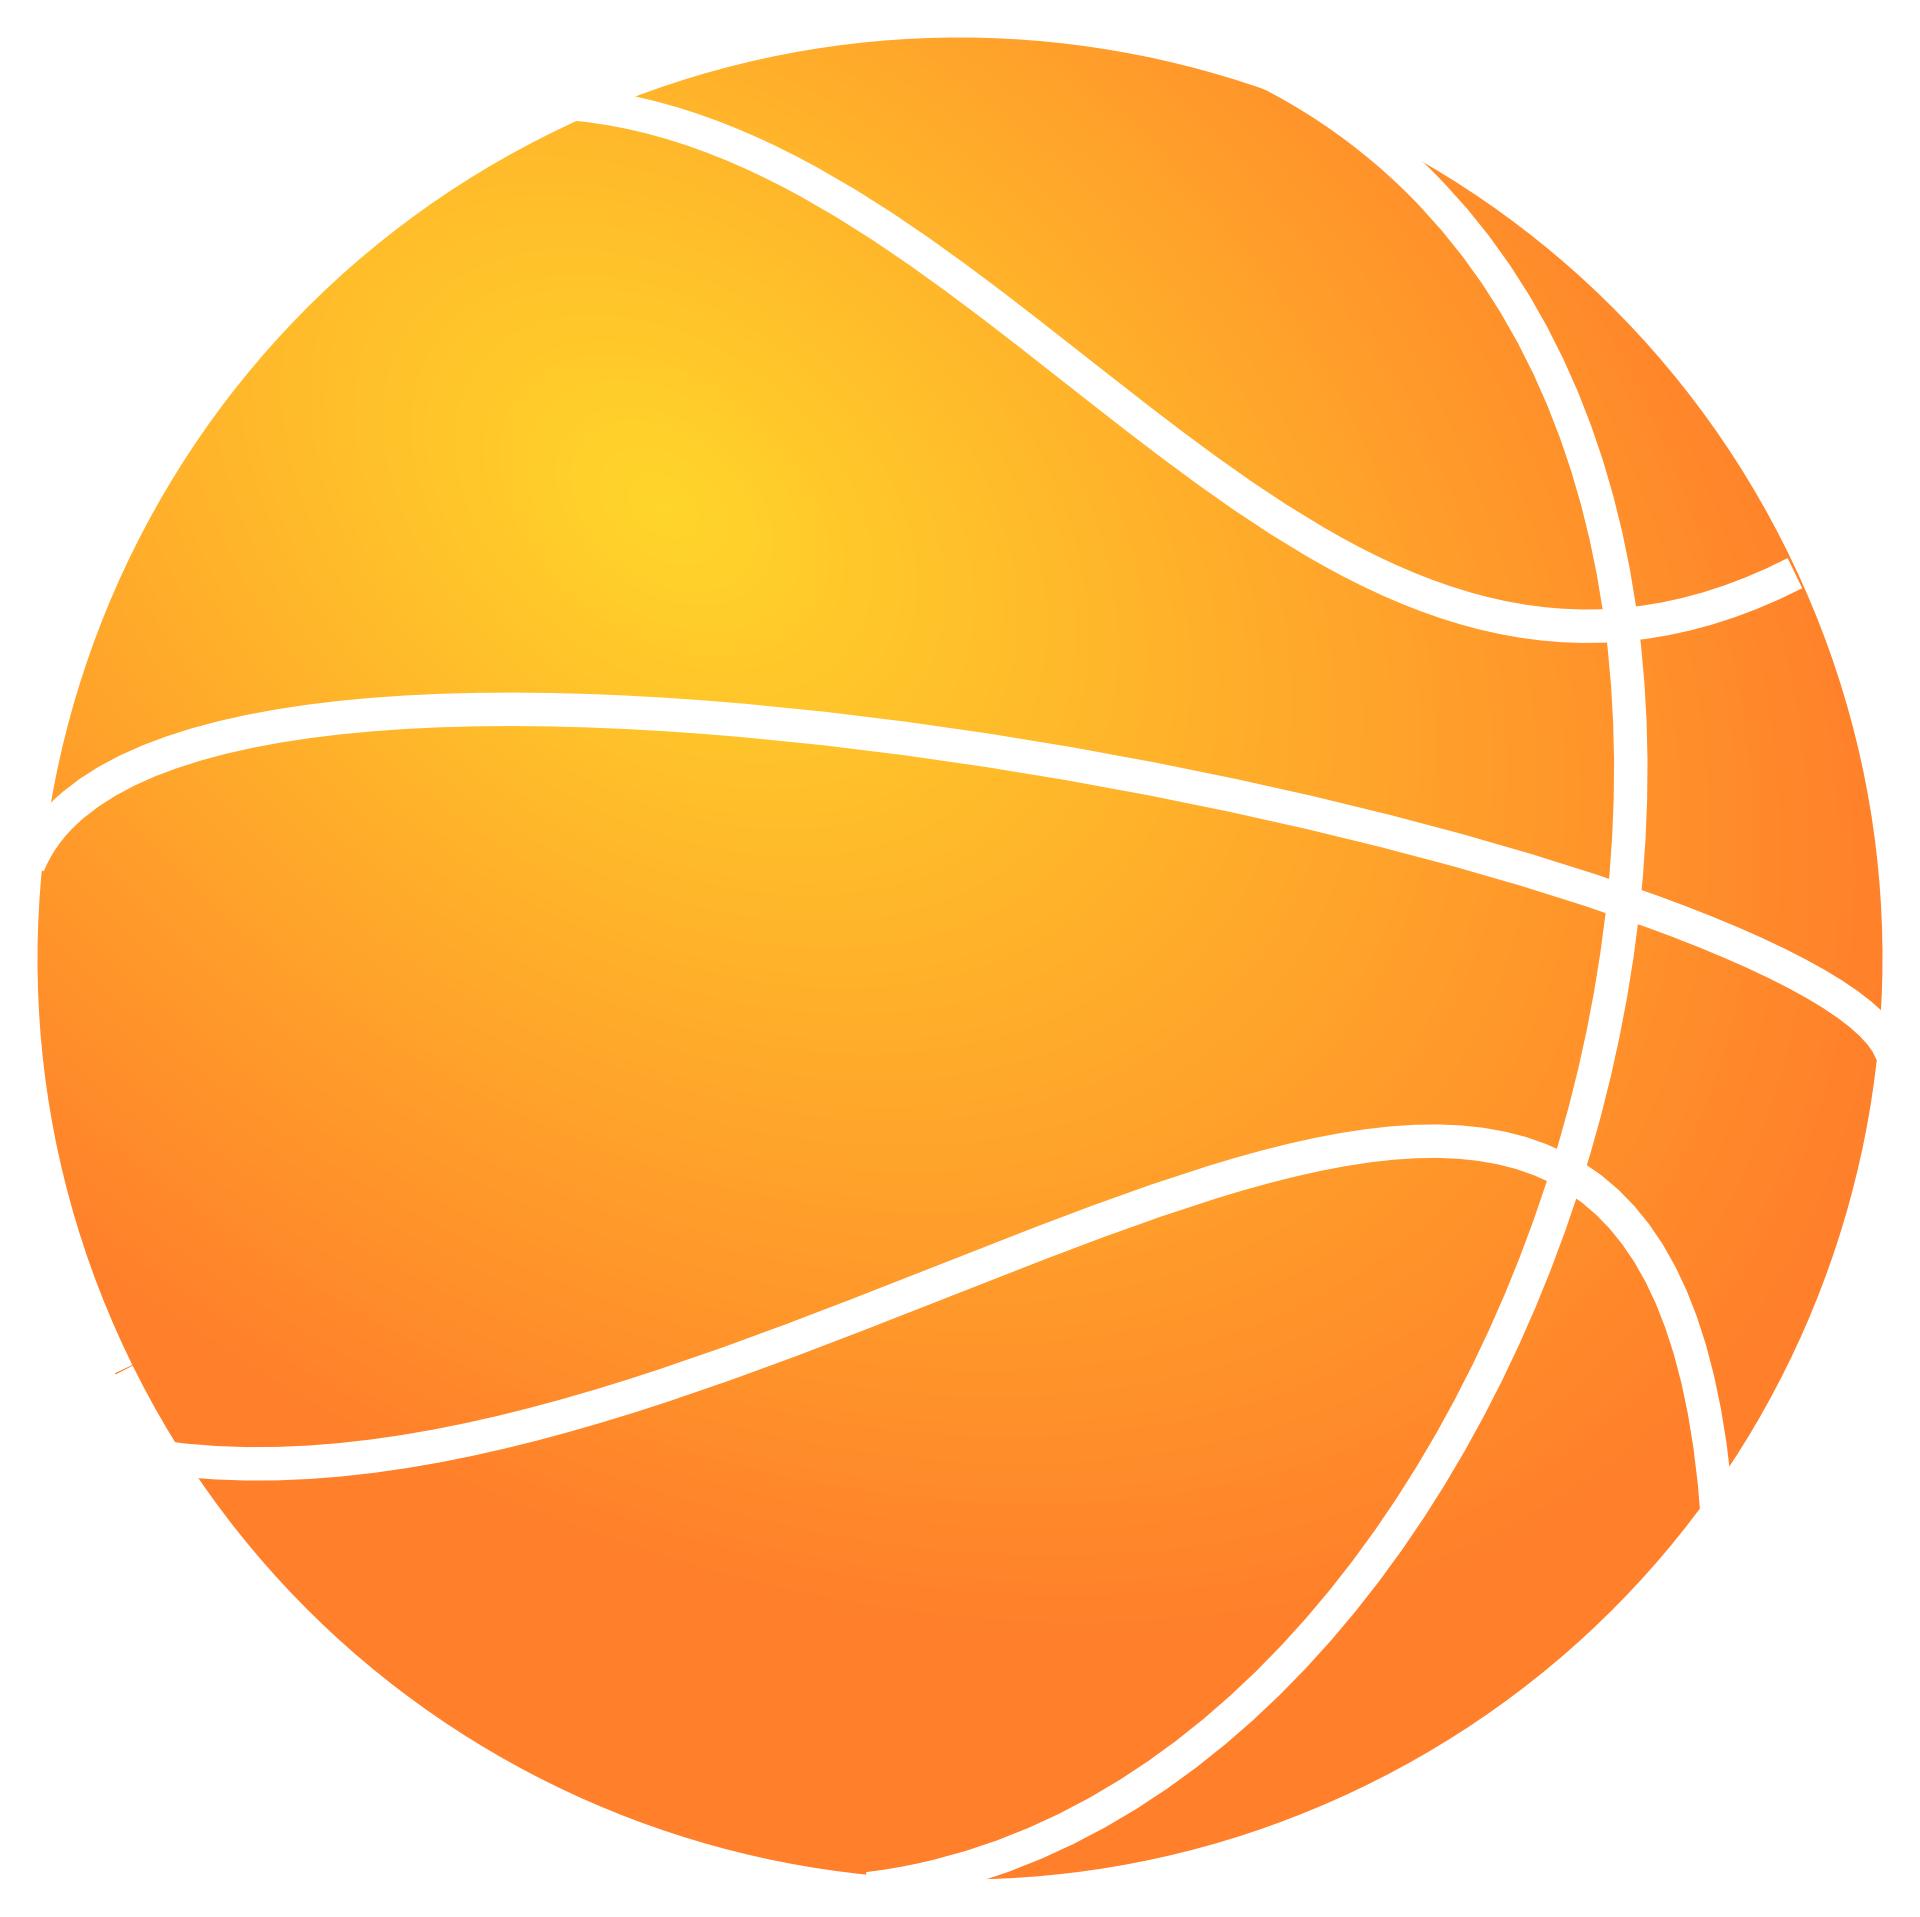 clipart free download Outline of art orange. Basketball clip